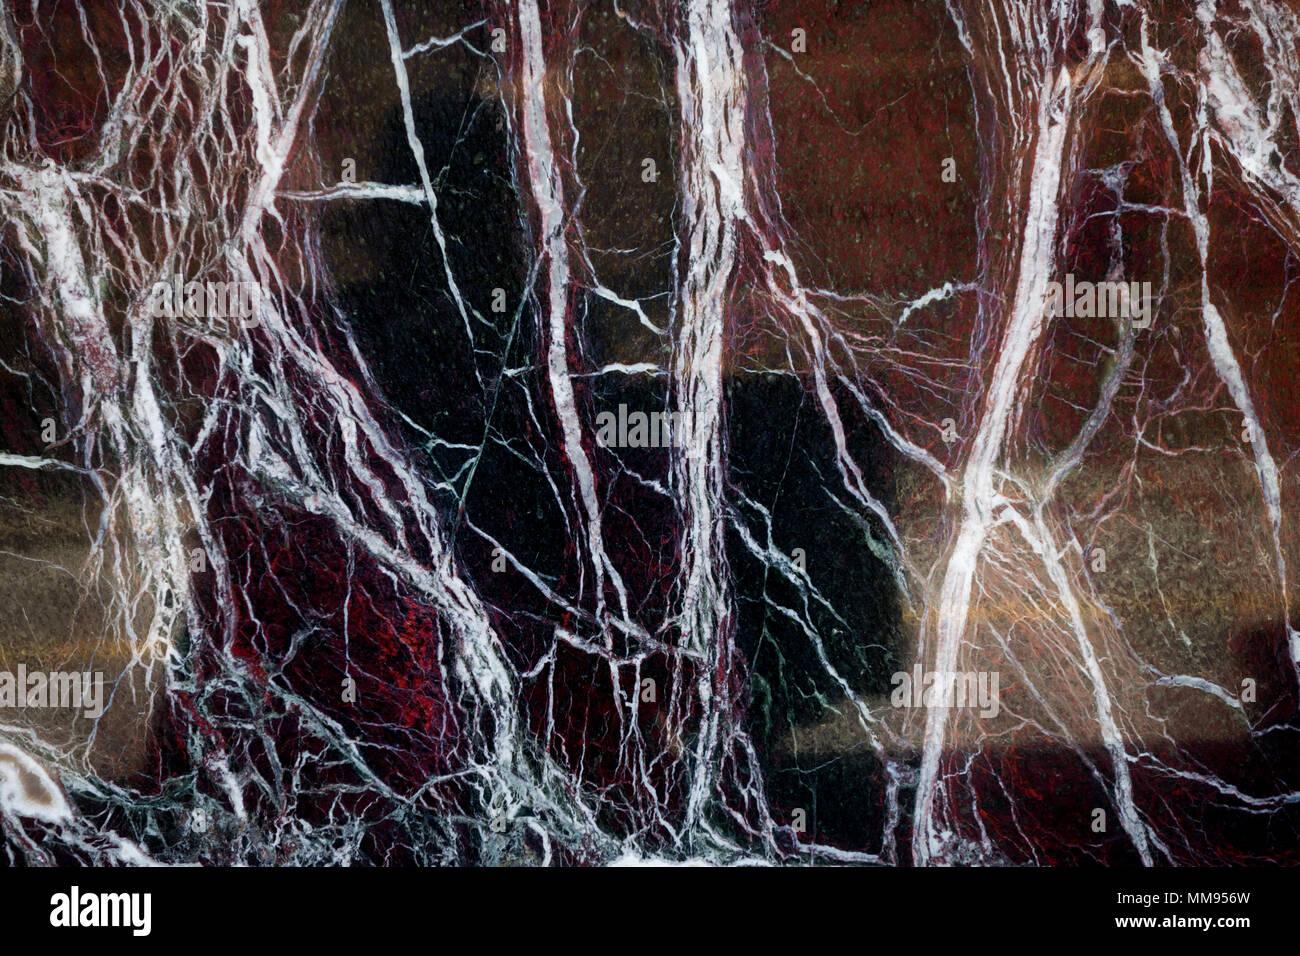 pattern in marble stockfotos pattern in marble bilder. Black Bedroom Furniture Sets. Home Design Ideas